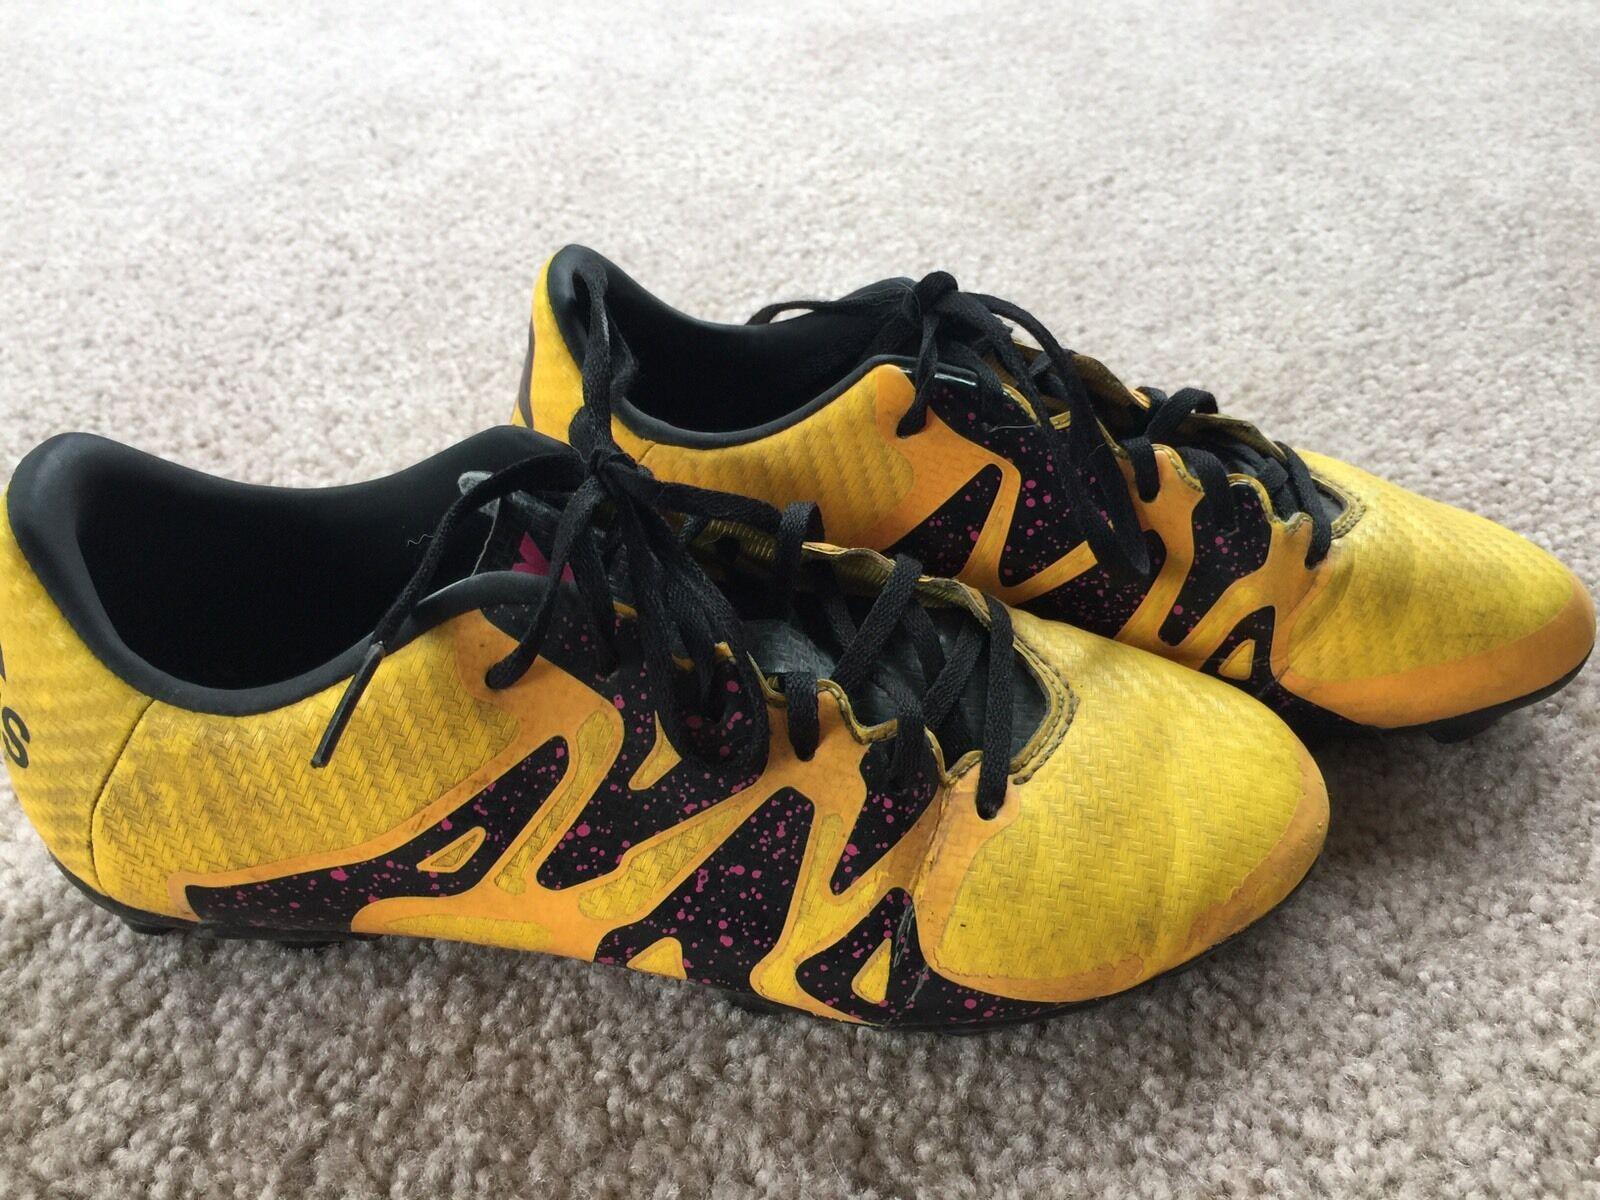 fada1cde6 Adidas Performance X 15.3 FGAG J Soccer Shoe (Big Kid) Size 4.5